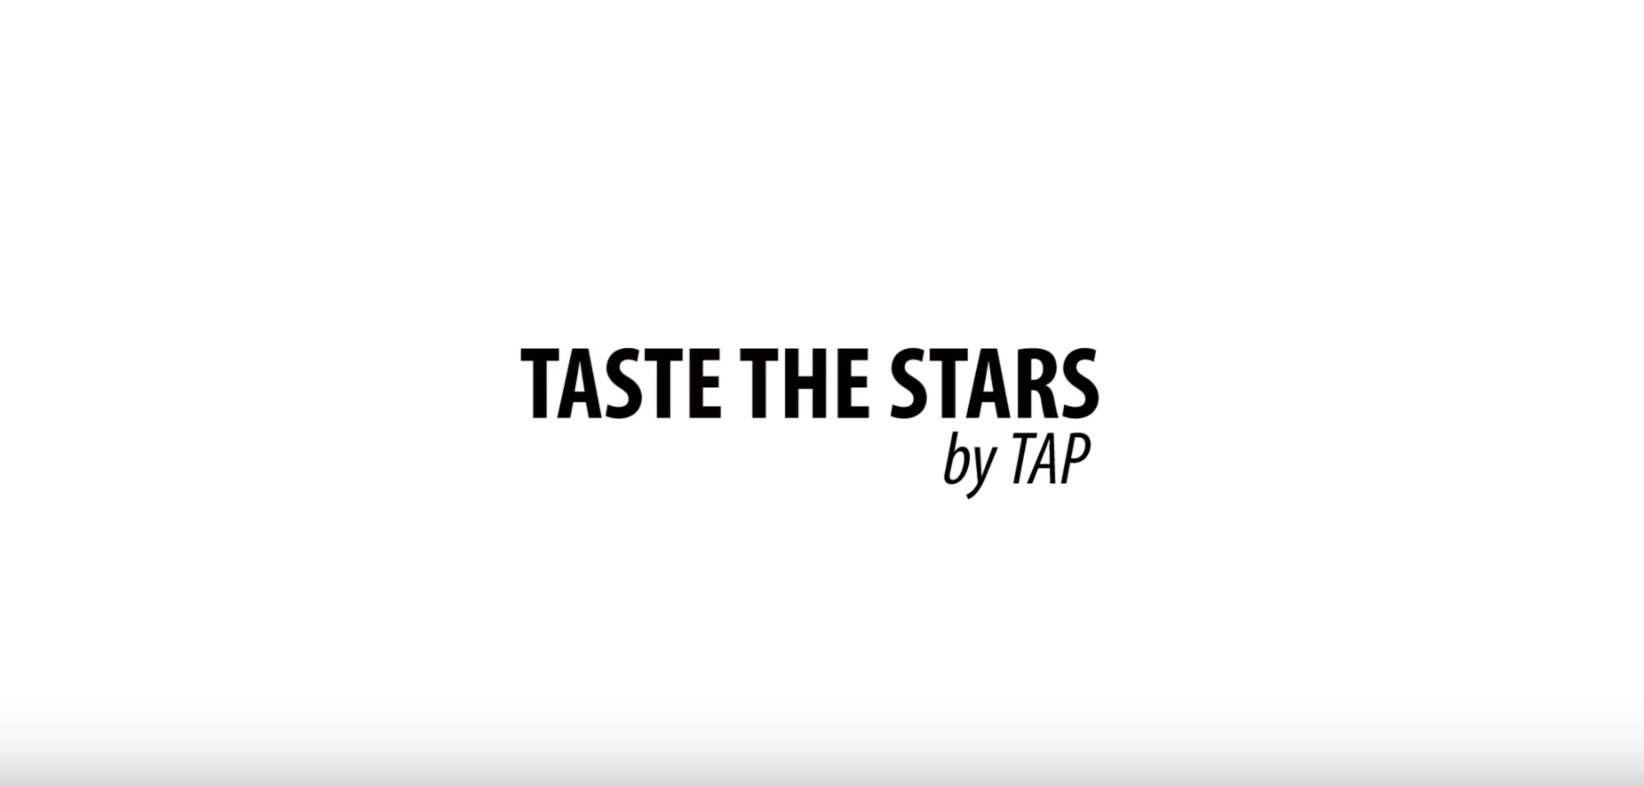 TAP terá cardápio assinado por chef's premiados com estrelas Michelin